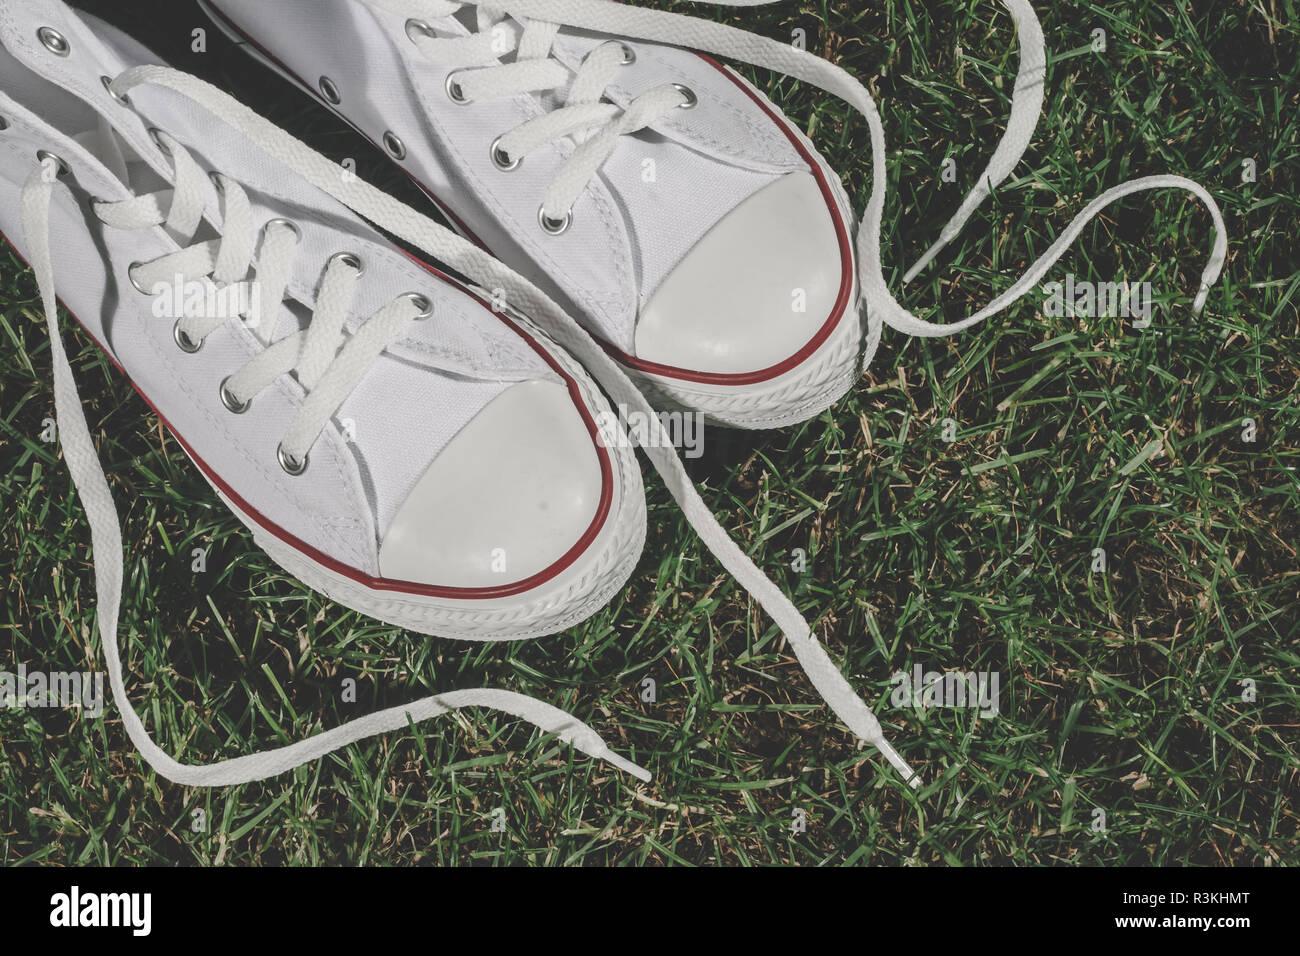 Stiefel Allstar Stockfotos & Stiefel Allstar Bilder Alamy